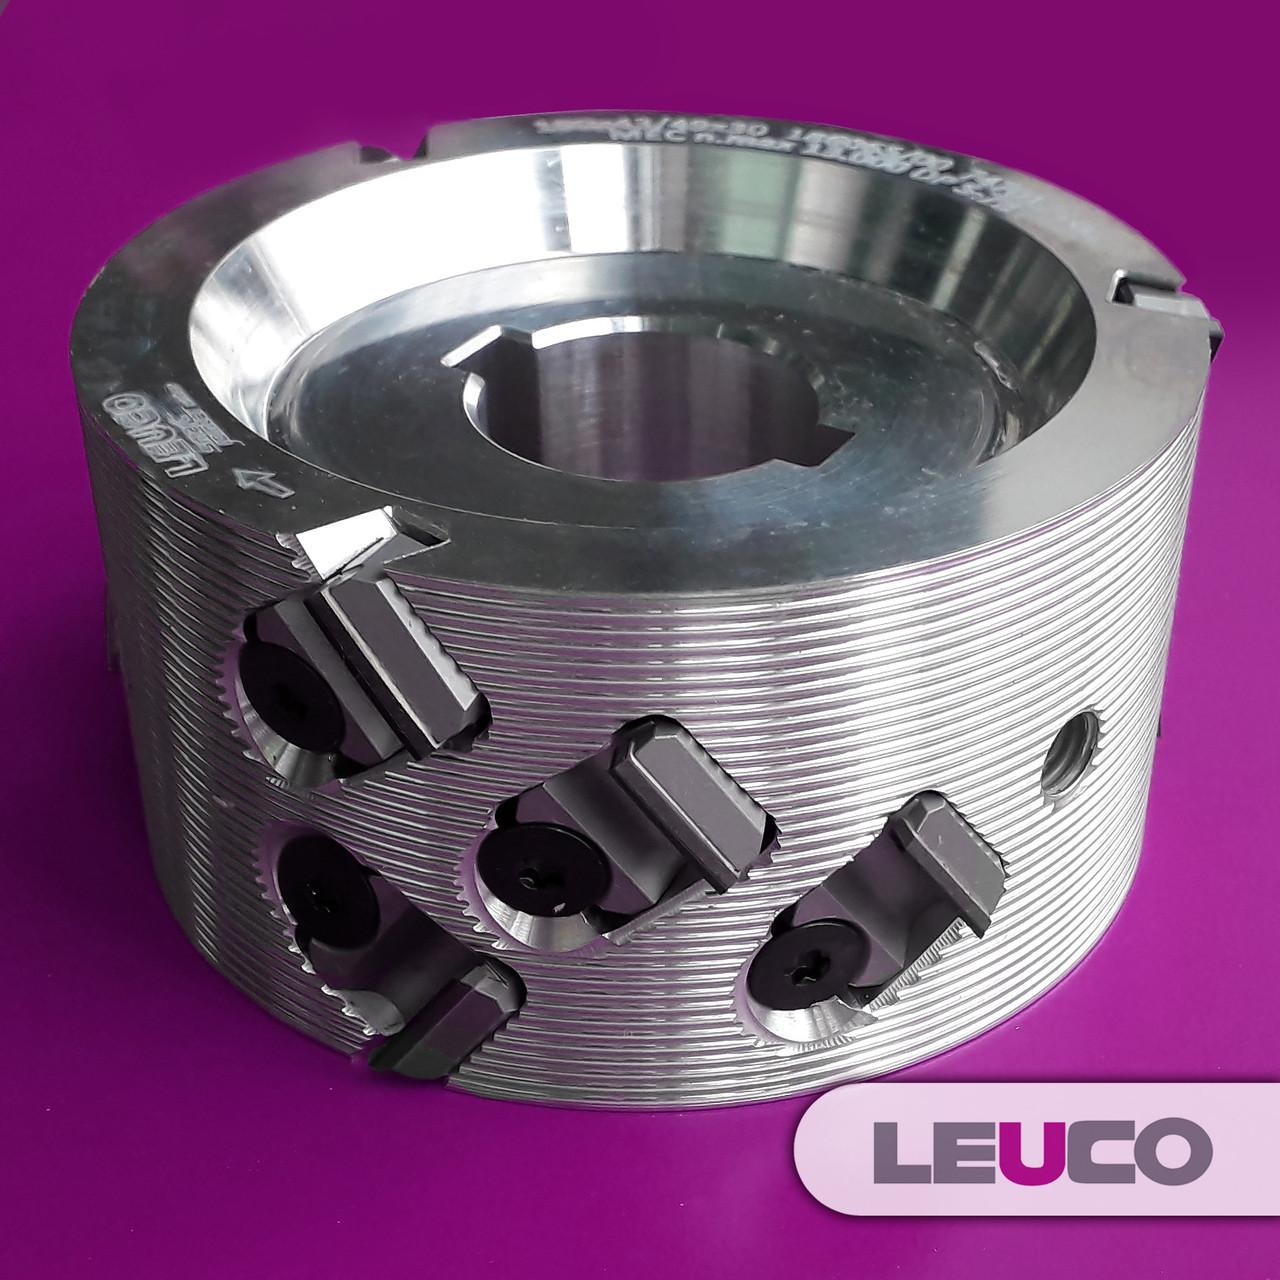 100x43x30, z=3+3 Алмазная фреза для прифуговки под кромку LEUCO DIAMAX SmartJointer airFace DP (Brandt)